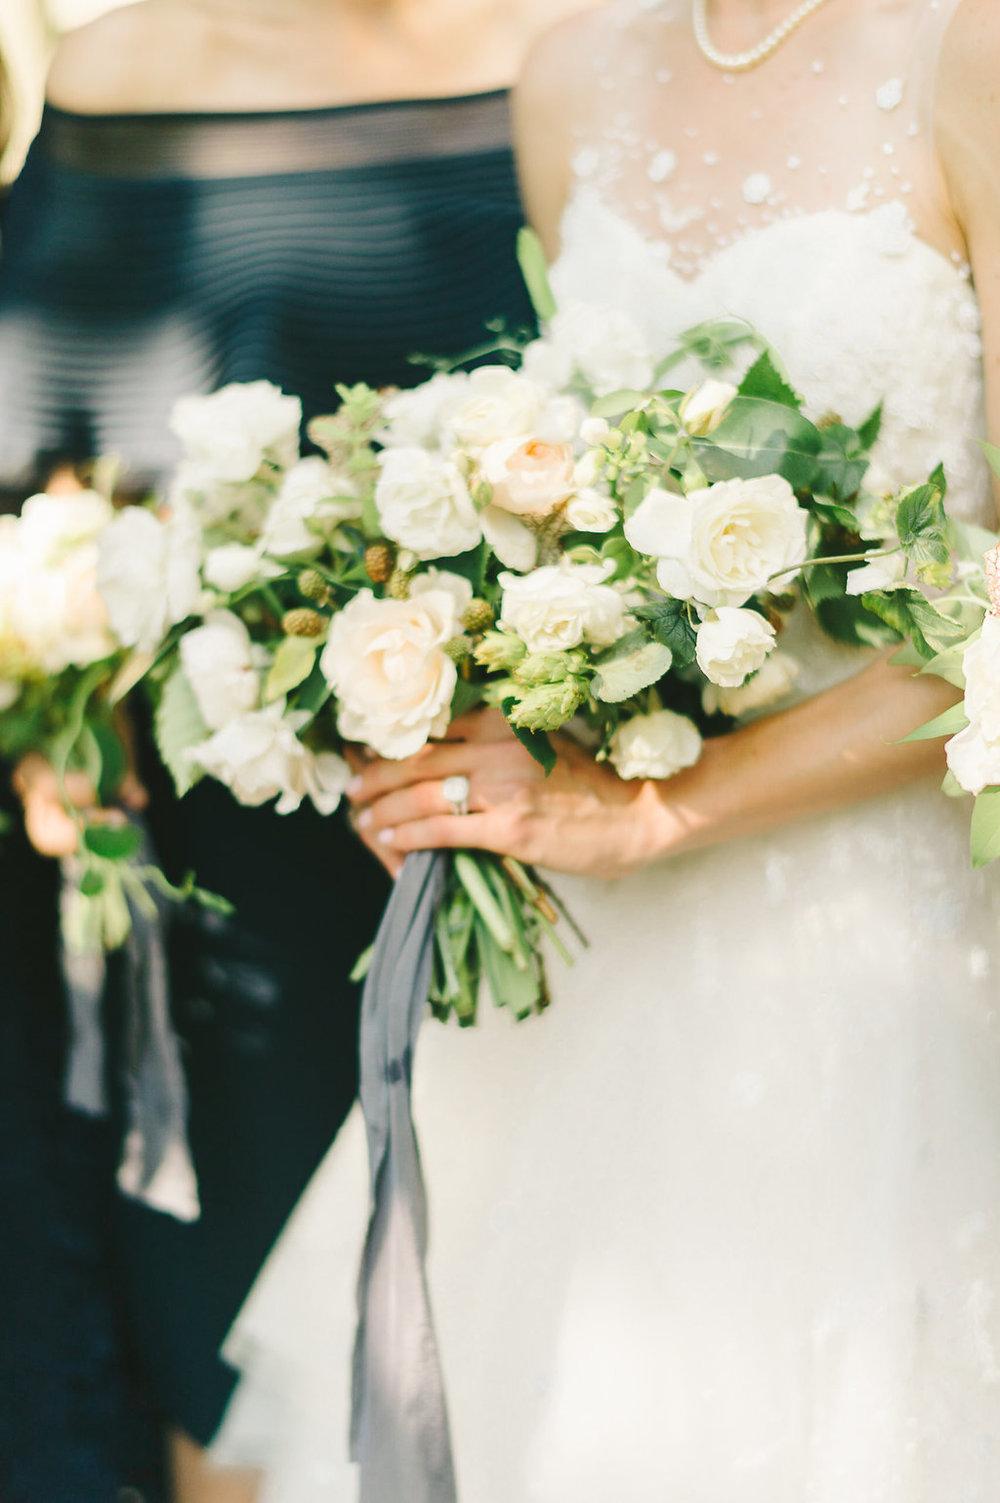 DC-Boutique-Wedding-Planner-Meridian-House-A-Griffin-Events-bouquet.jpg